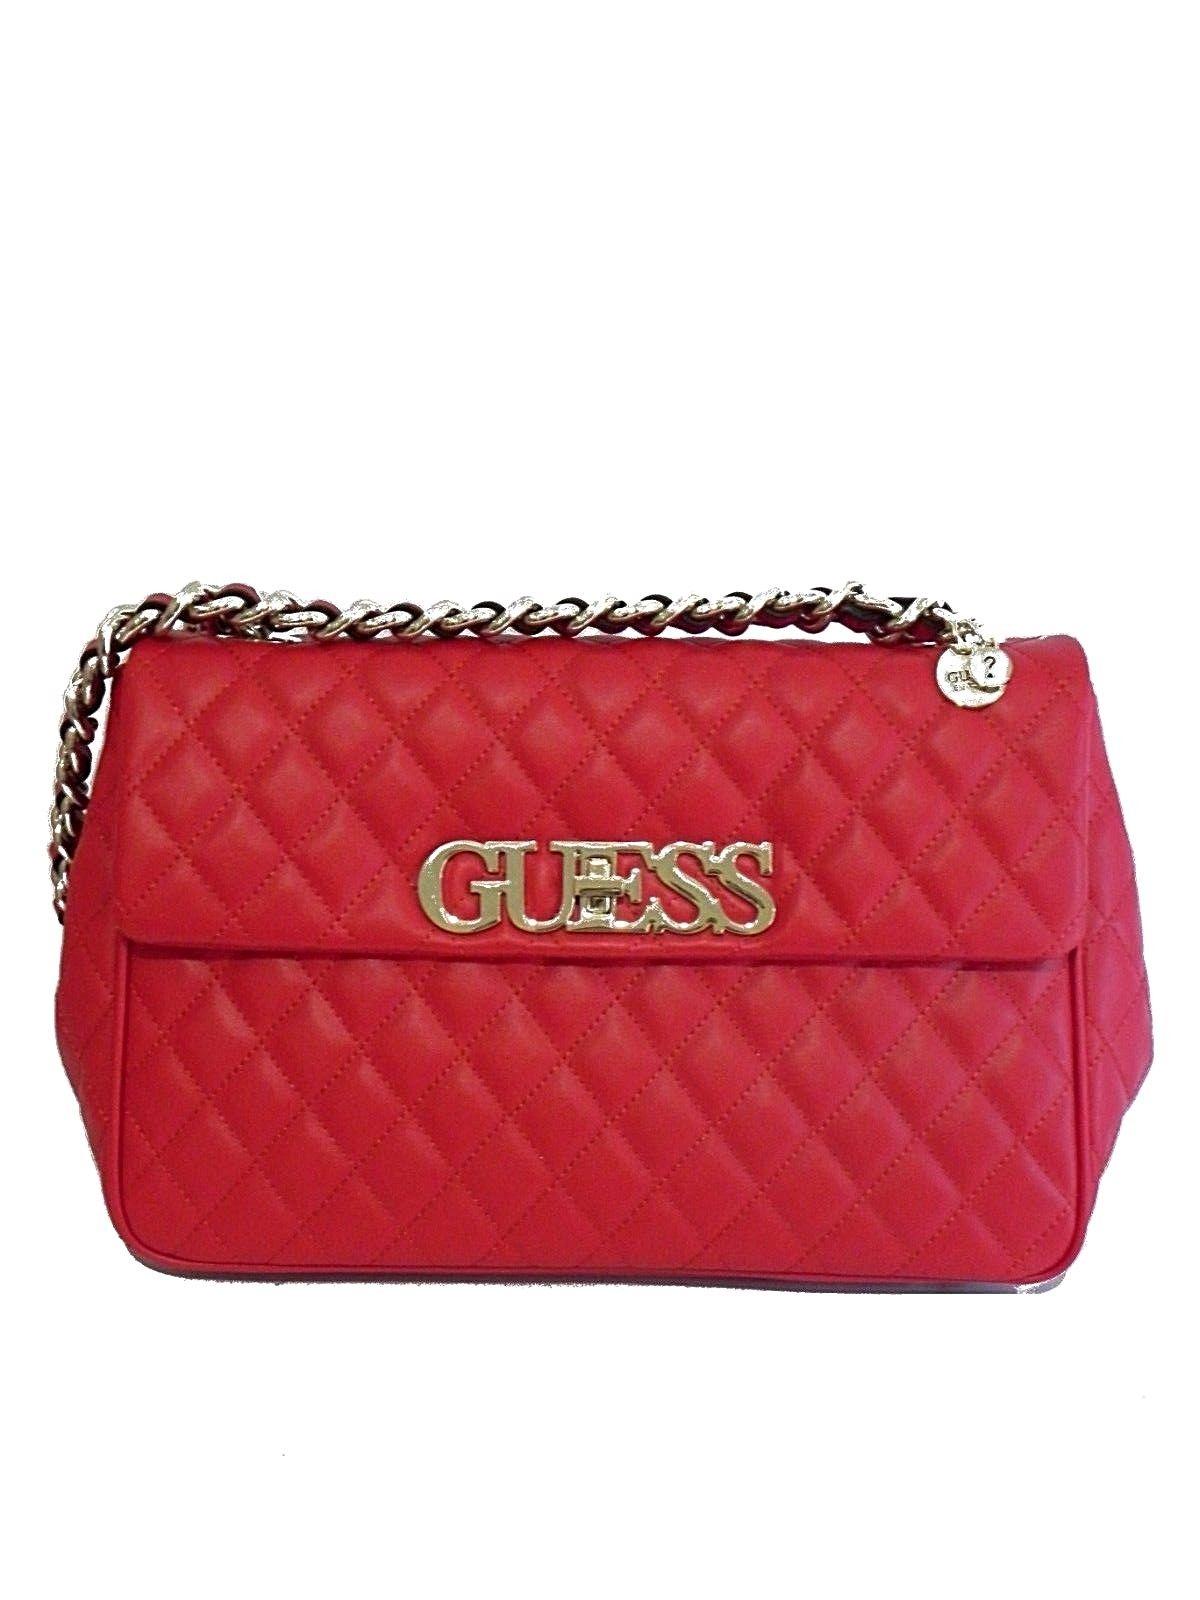 Borsa Guess sweet candy shopper VG717519 rosso – Buonocore Borse aa613681c7f